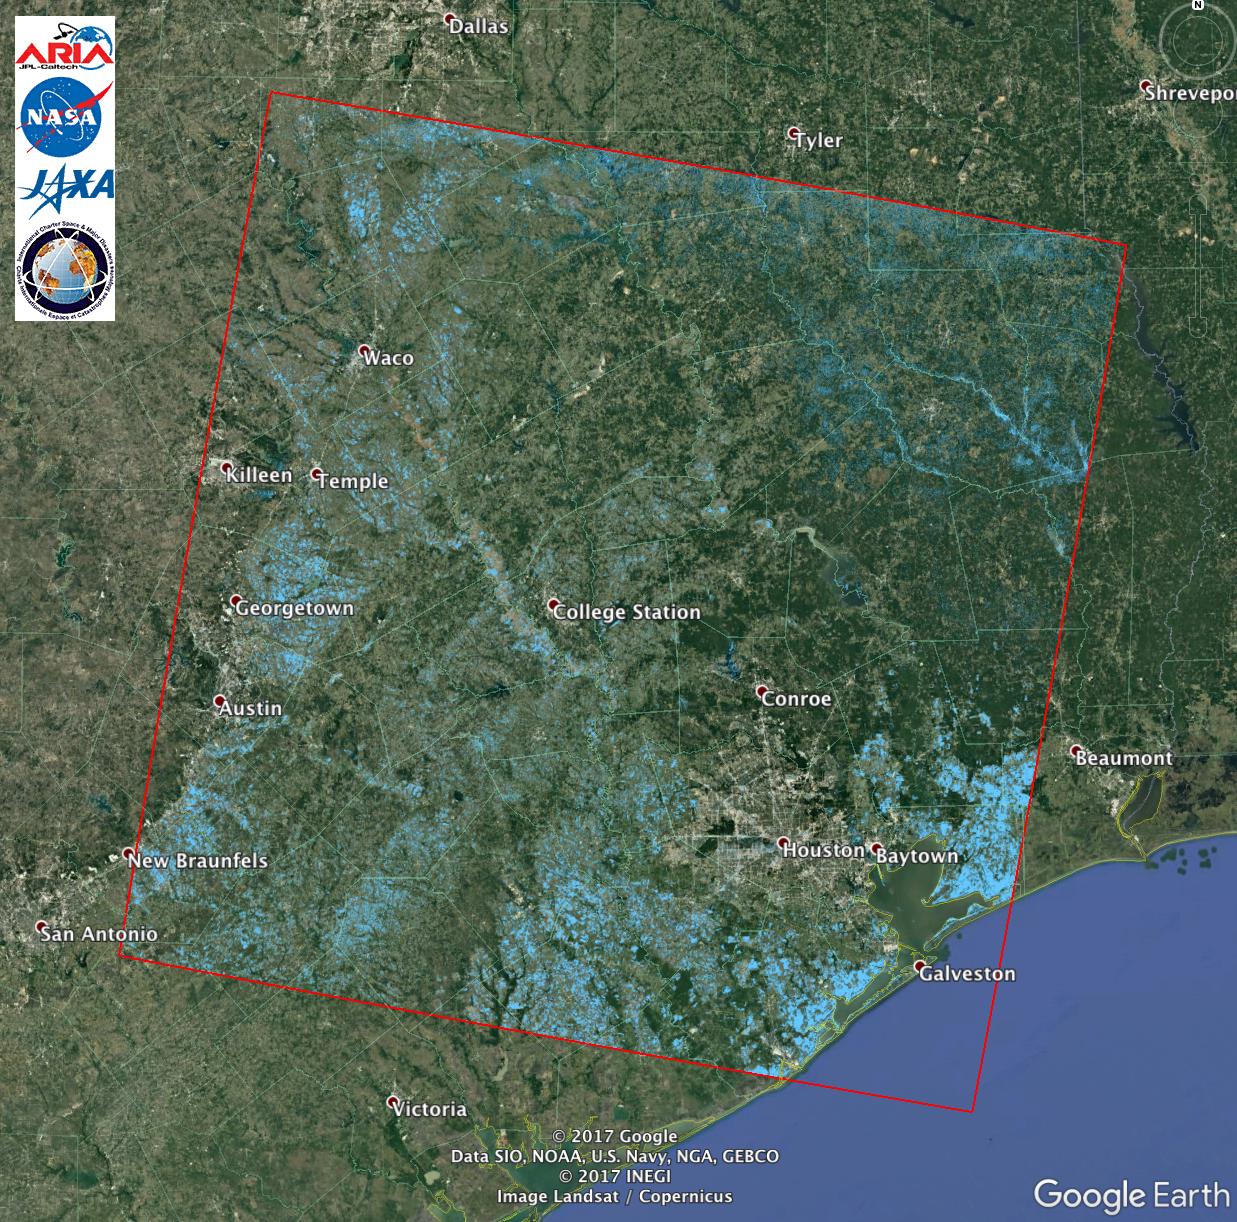 Map Of Texas Floods ARIA ALOS 2 Flood Proxy Map of Texas Flooding from Harvey | NASA